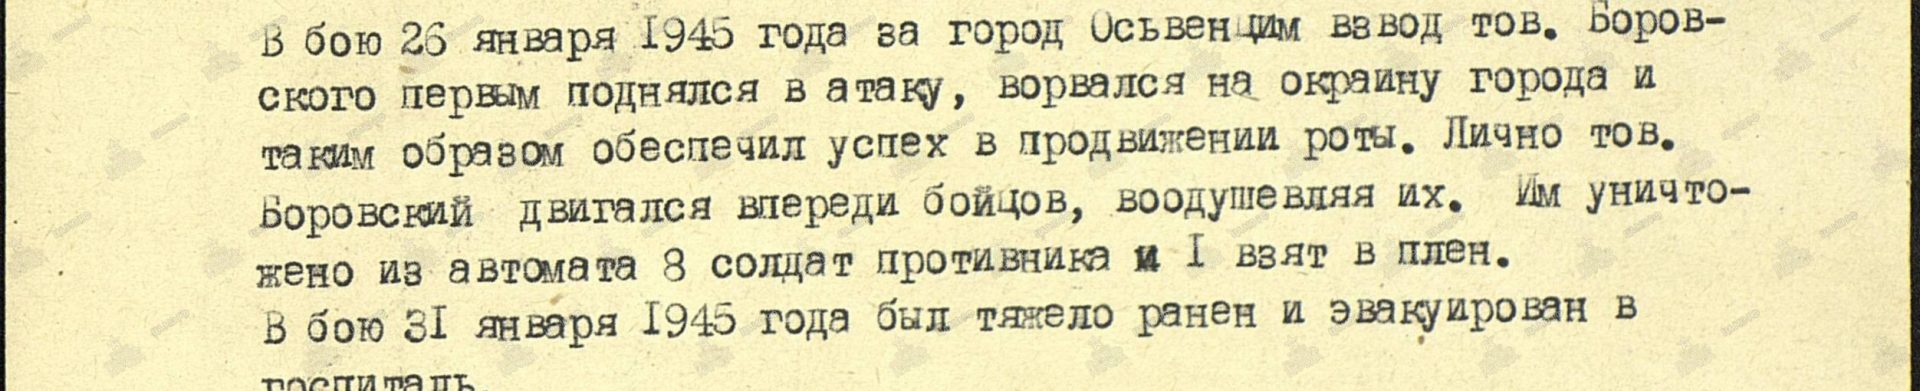 Боровский Павел Маркович